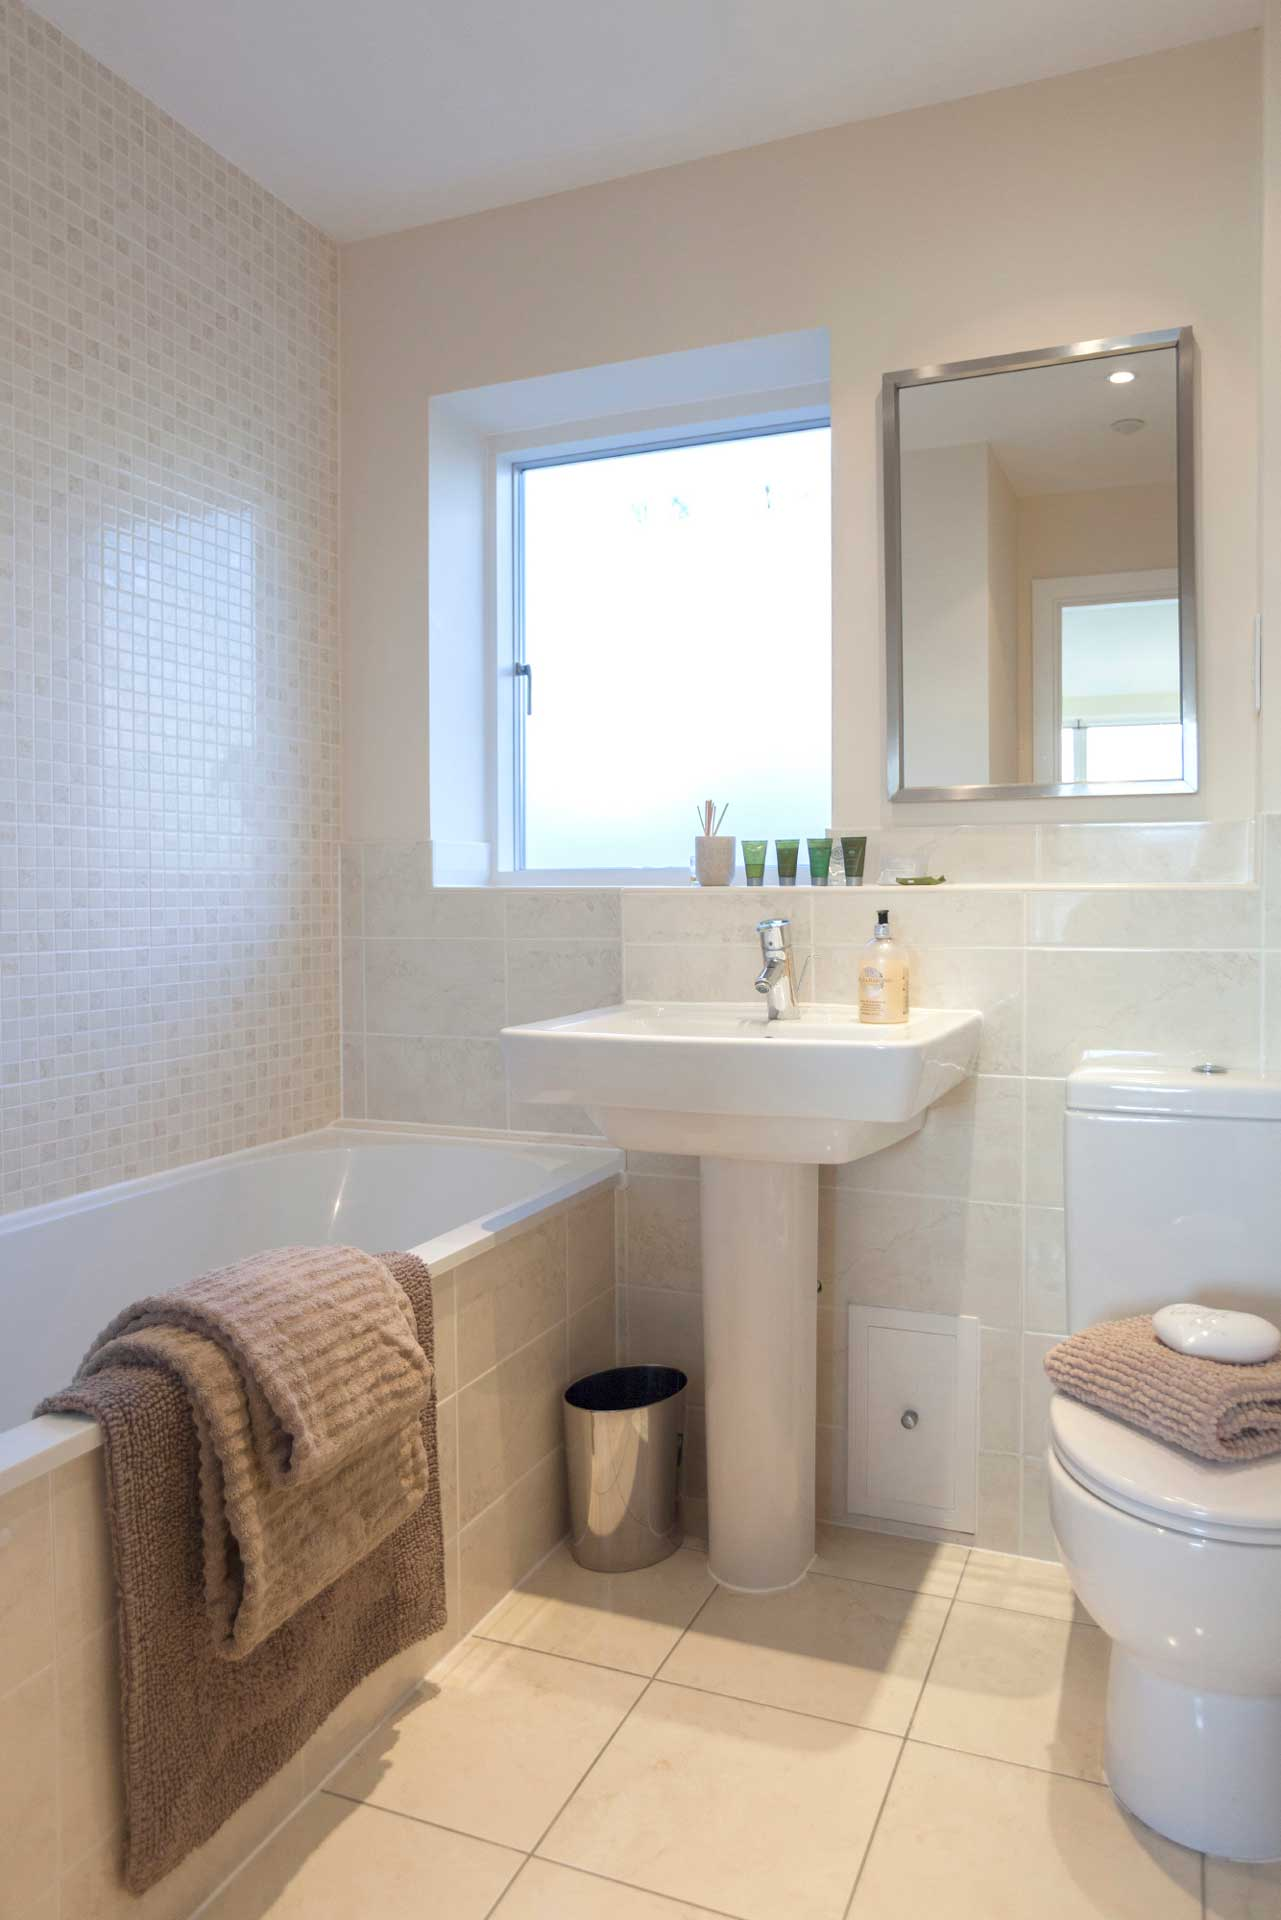 Howells-Mere-3-Lower-Mill-Estate-Rentals-Bathroom-3a